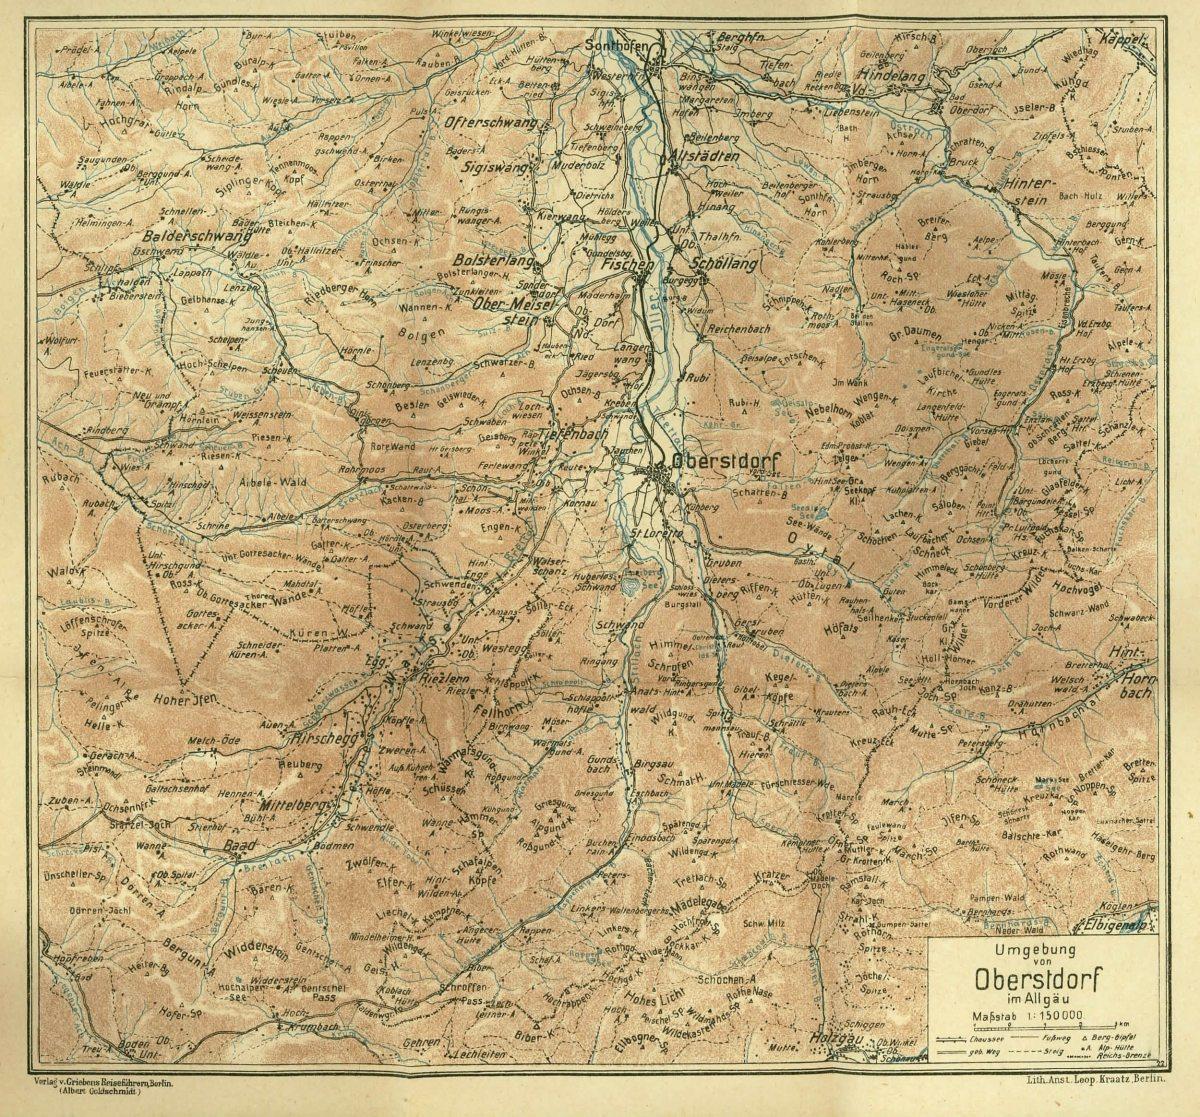 Griebens Reiseführer 1922 Karte